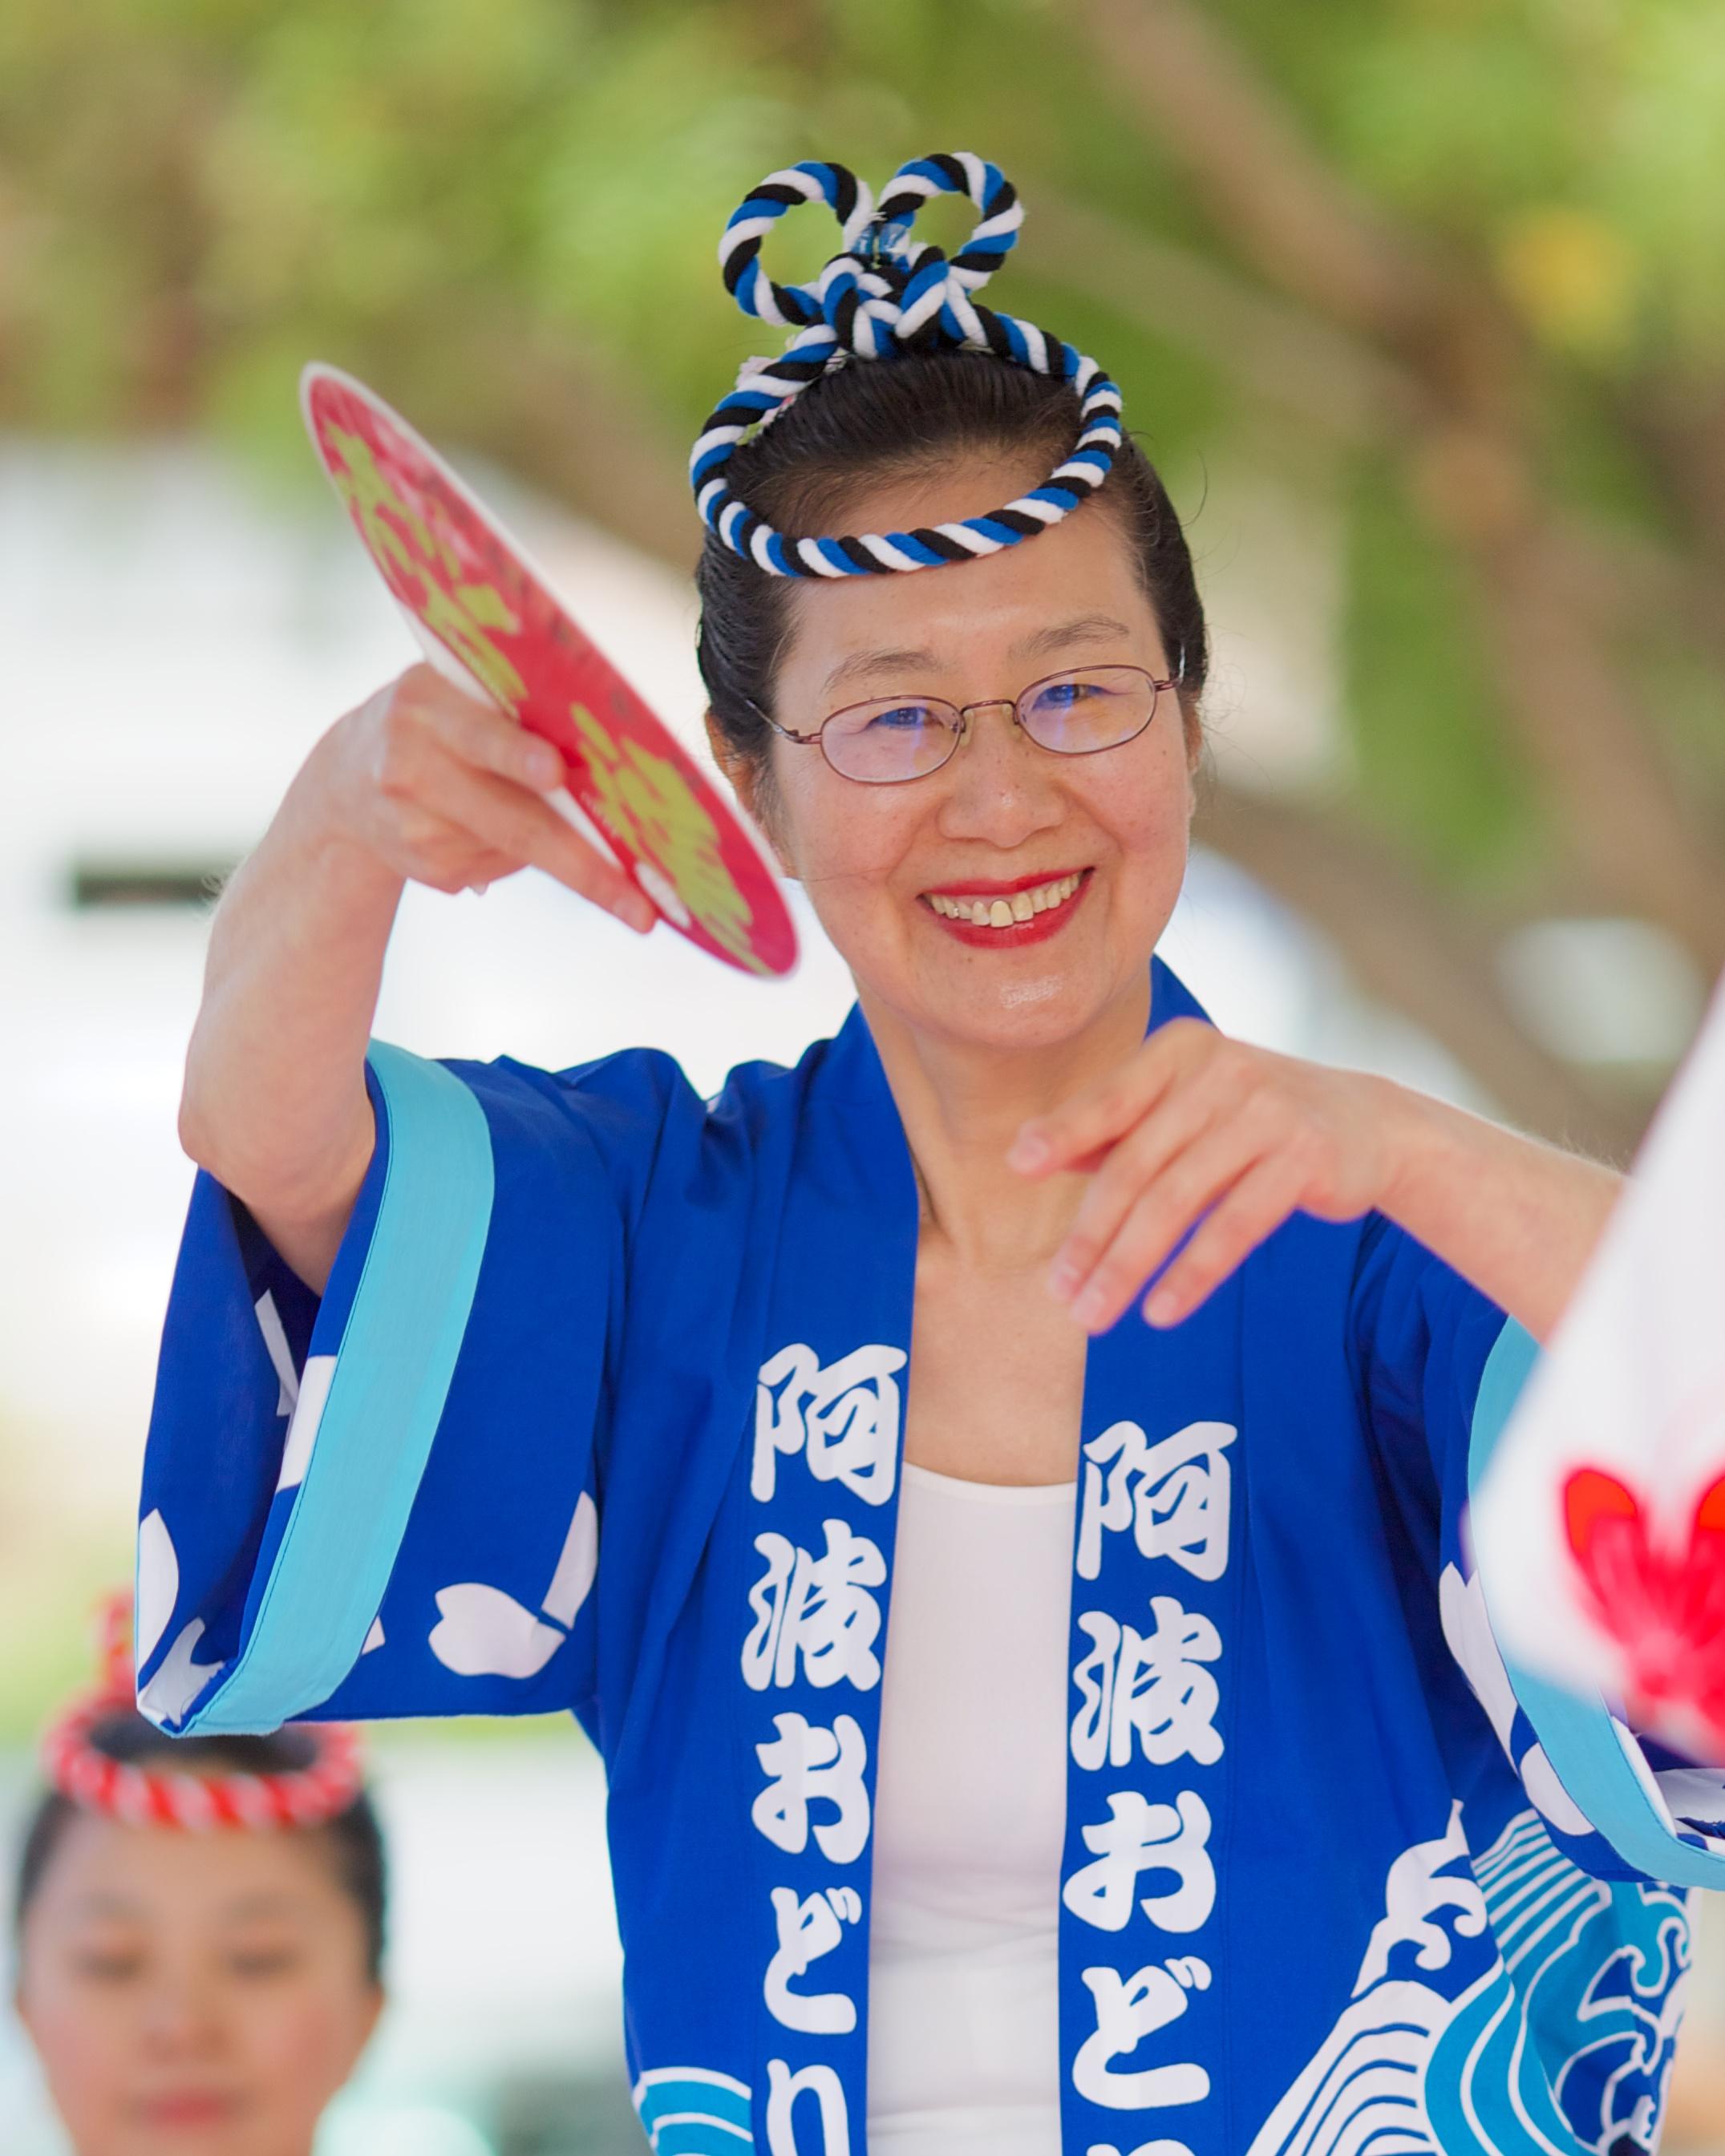 hiroko---sakura-ren---japanese-cultural-fair-of-santa-cruz-2015_19570437636_o.jpg